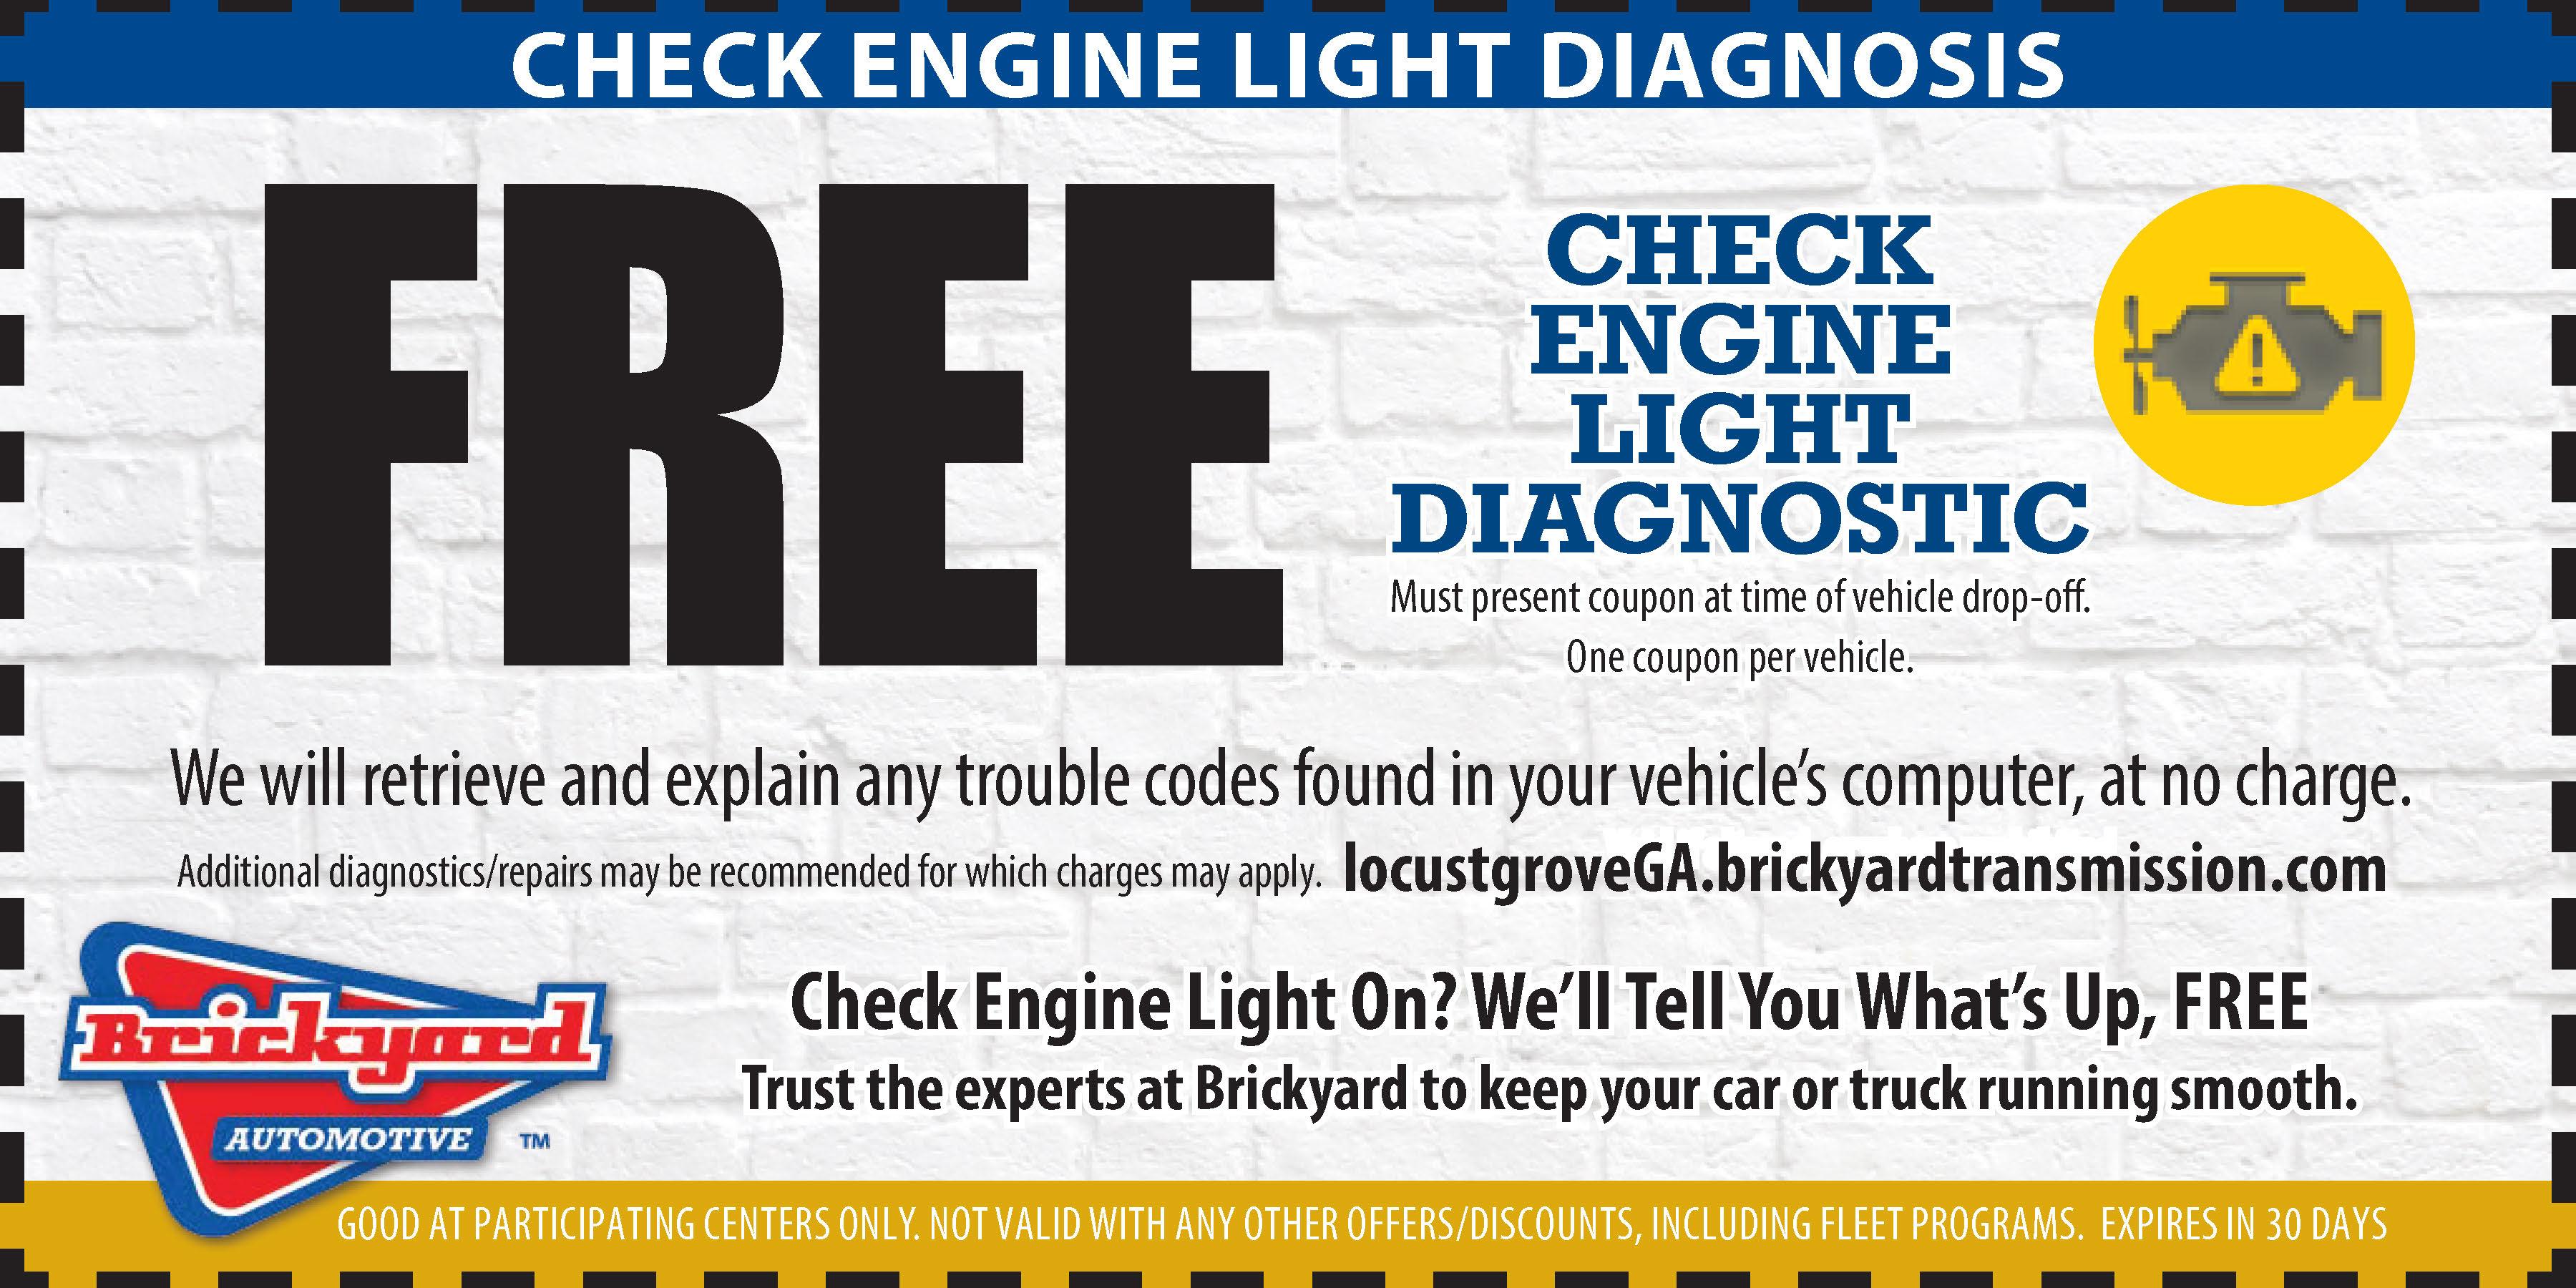 Check Engine Light Diagnositics